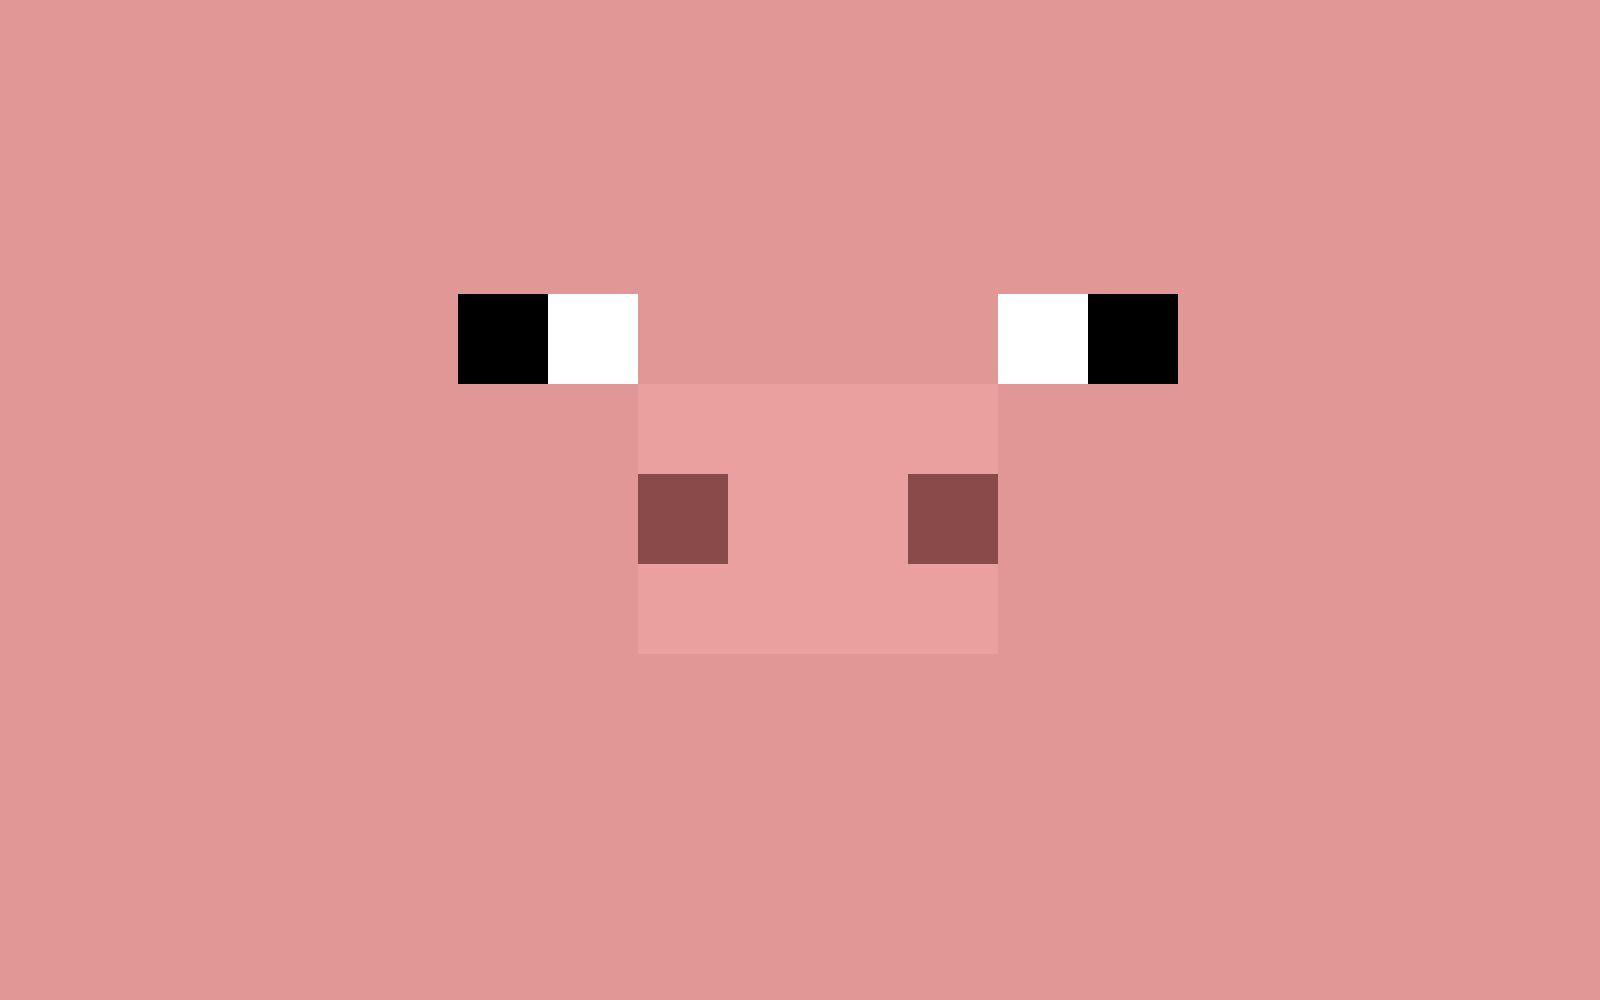 Pin By April Lapierre Kvetkosky On Minecraft Party Minecraft Pig Minecraft Pig Face Minecraft Wallpaper